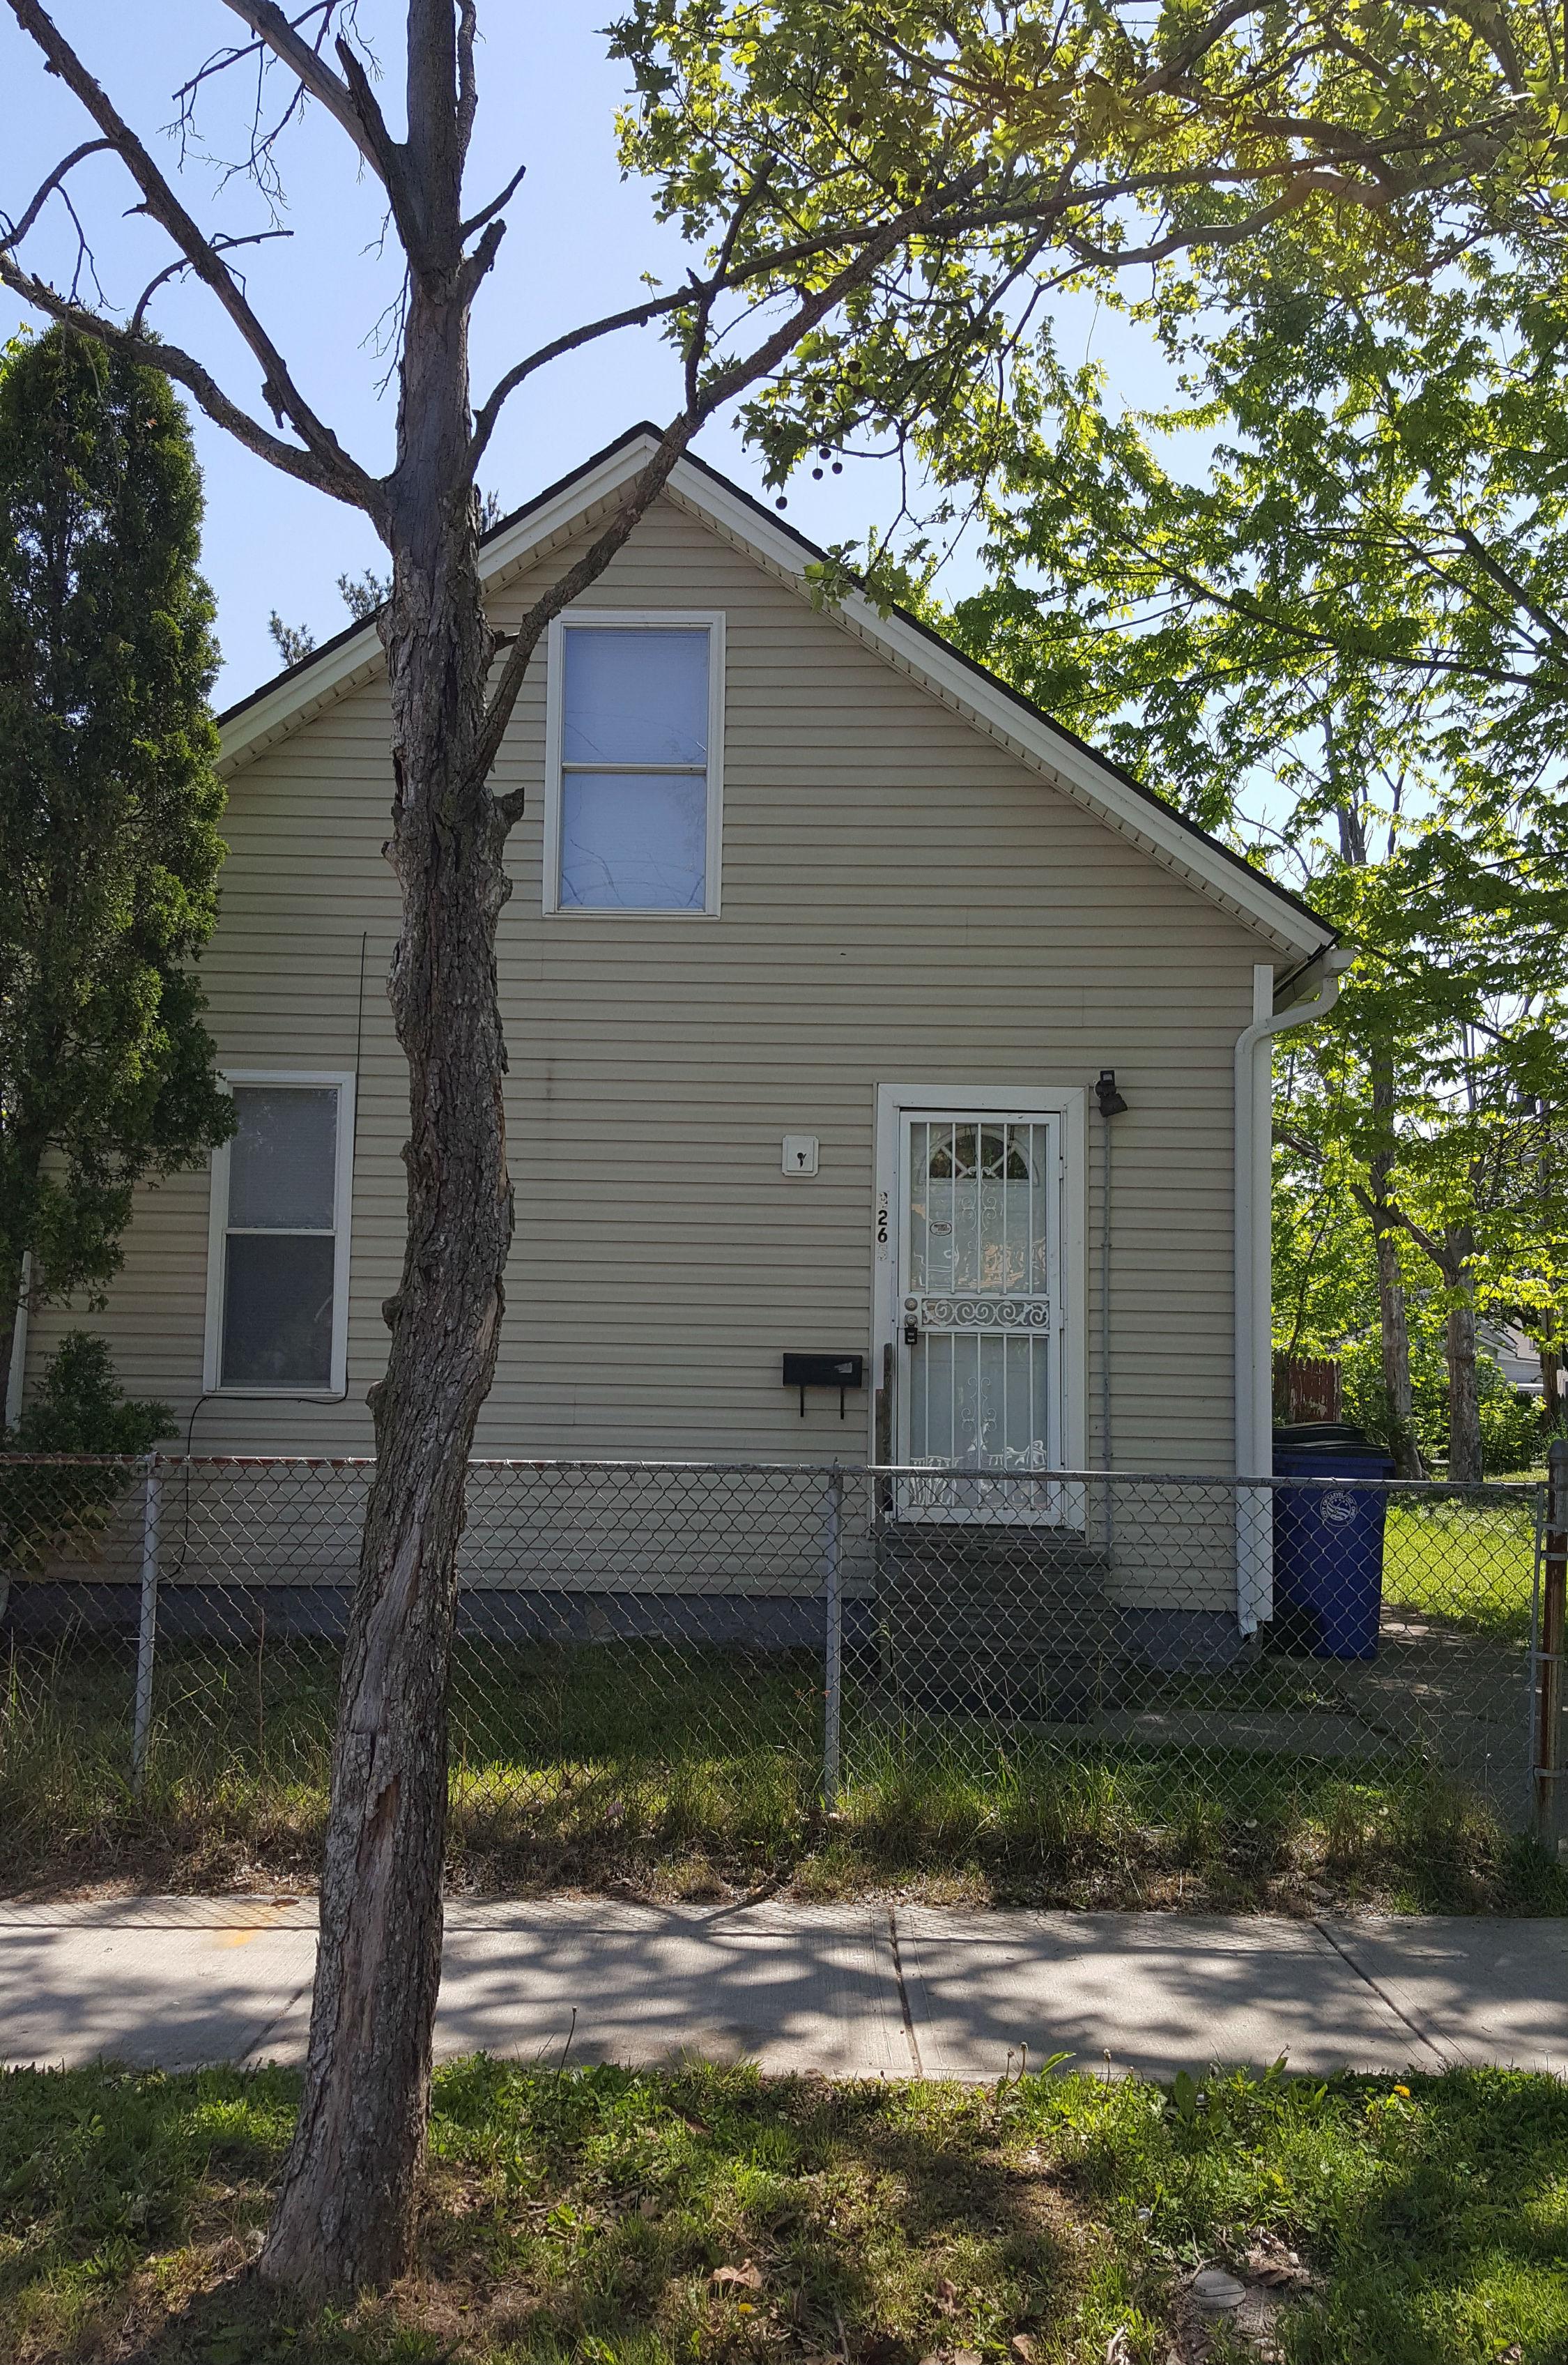 3265 W 44 St., Cleveland | 5 bed 2 bath | 1,320 Sq. Ft. | $35,000